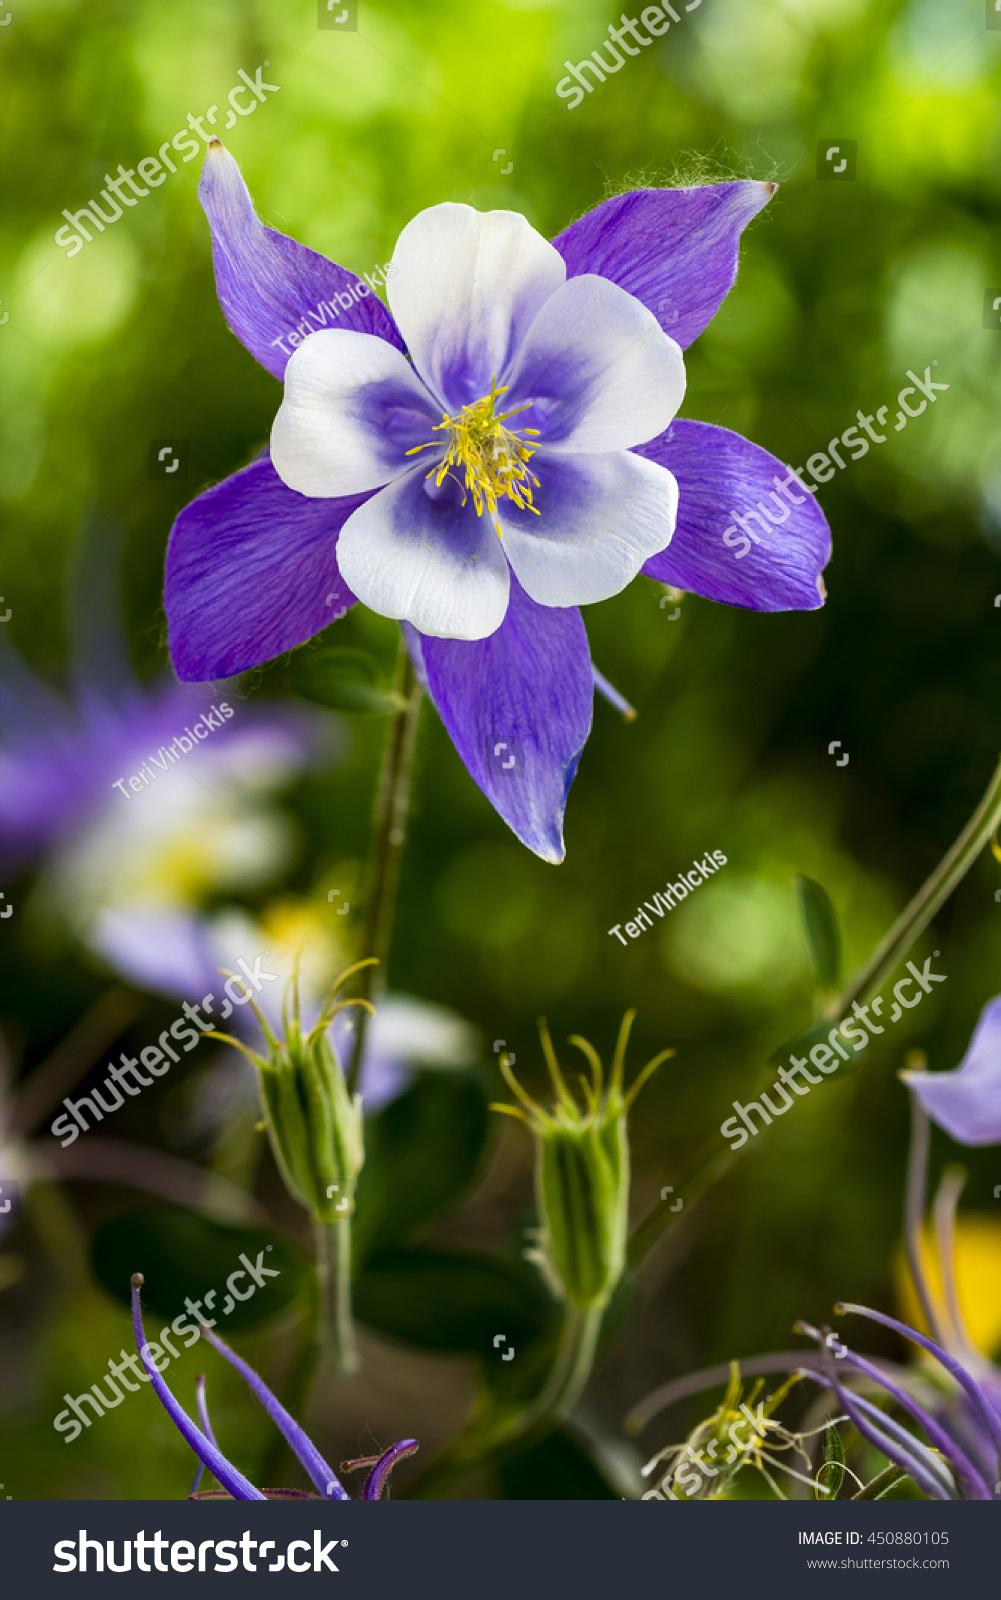 Single stem blue columbine flower bloom stock photo 450880105 single stem of blue columbine flower bloom with two unopened buds izmirmasajfo Images